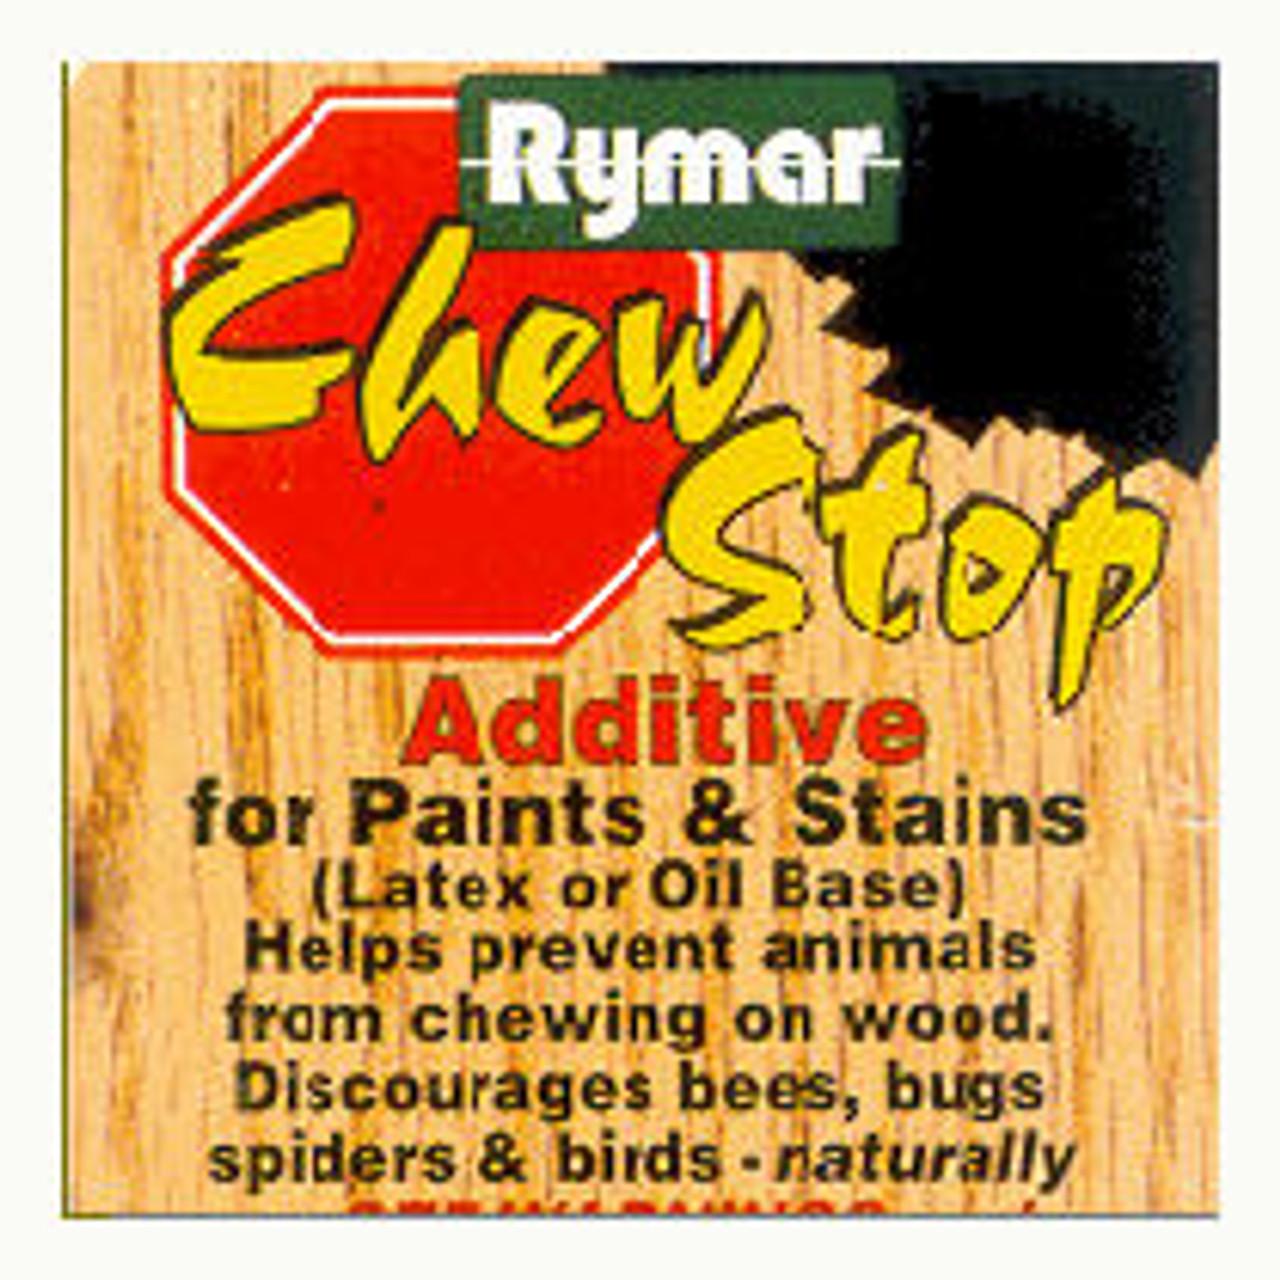 rymar chew stop additive